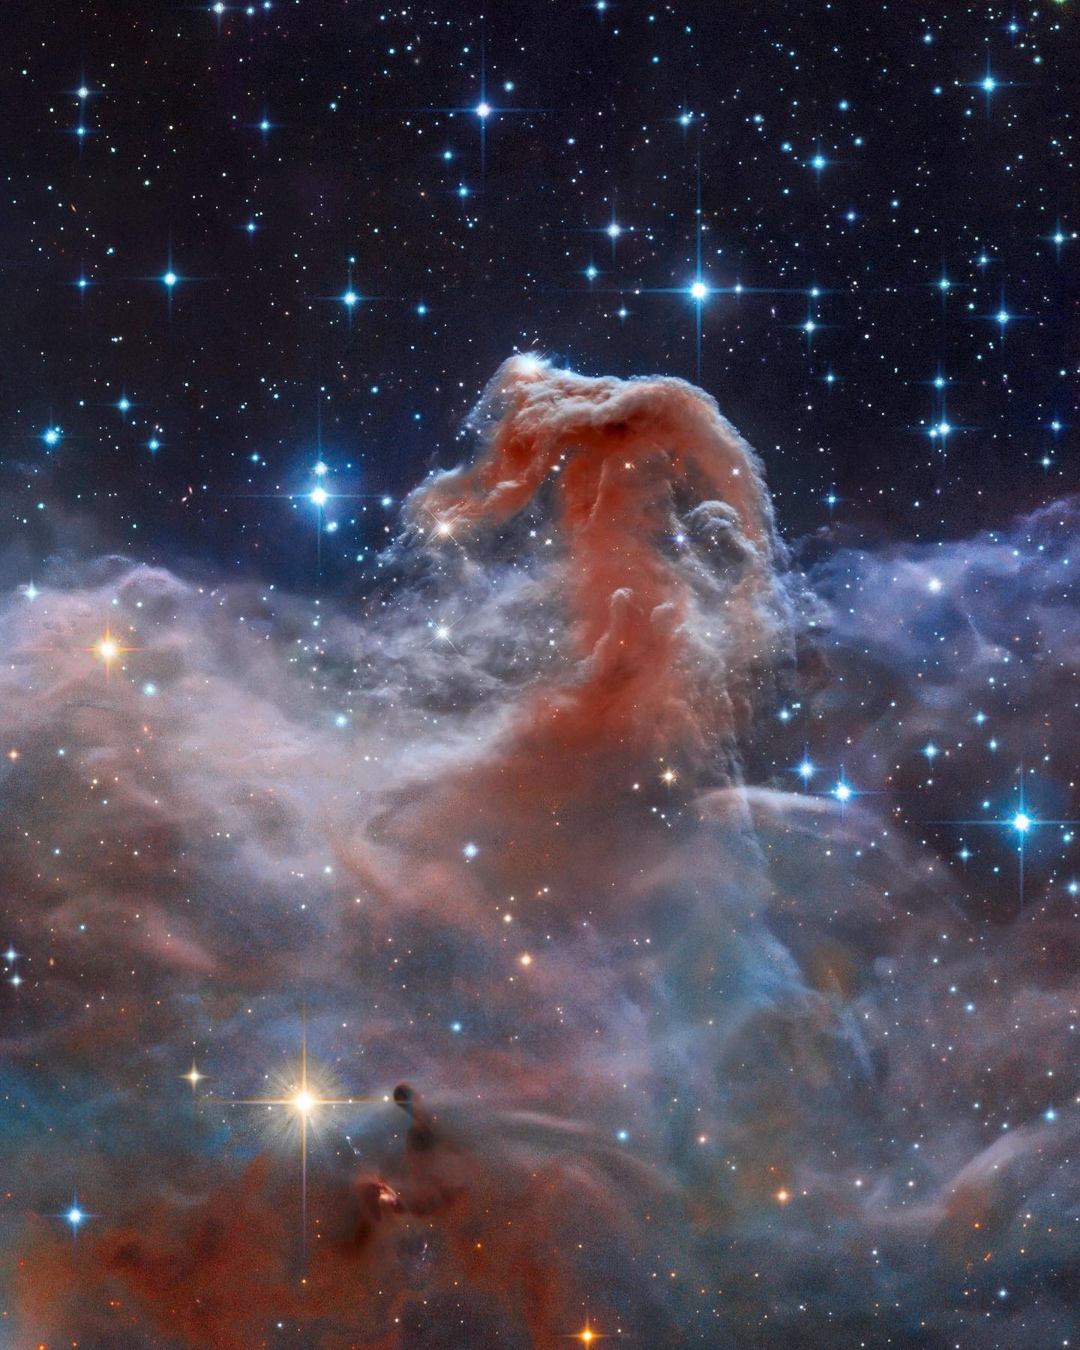 A rare horse-shaped nebula in the night sky.